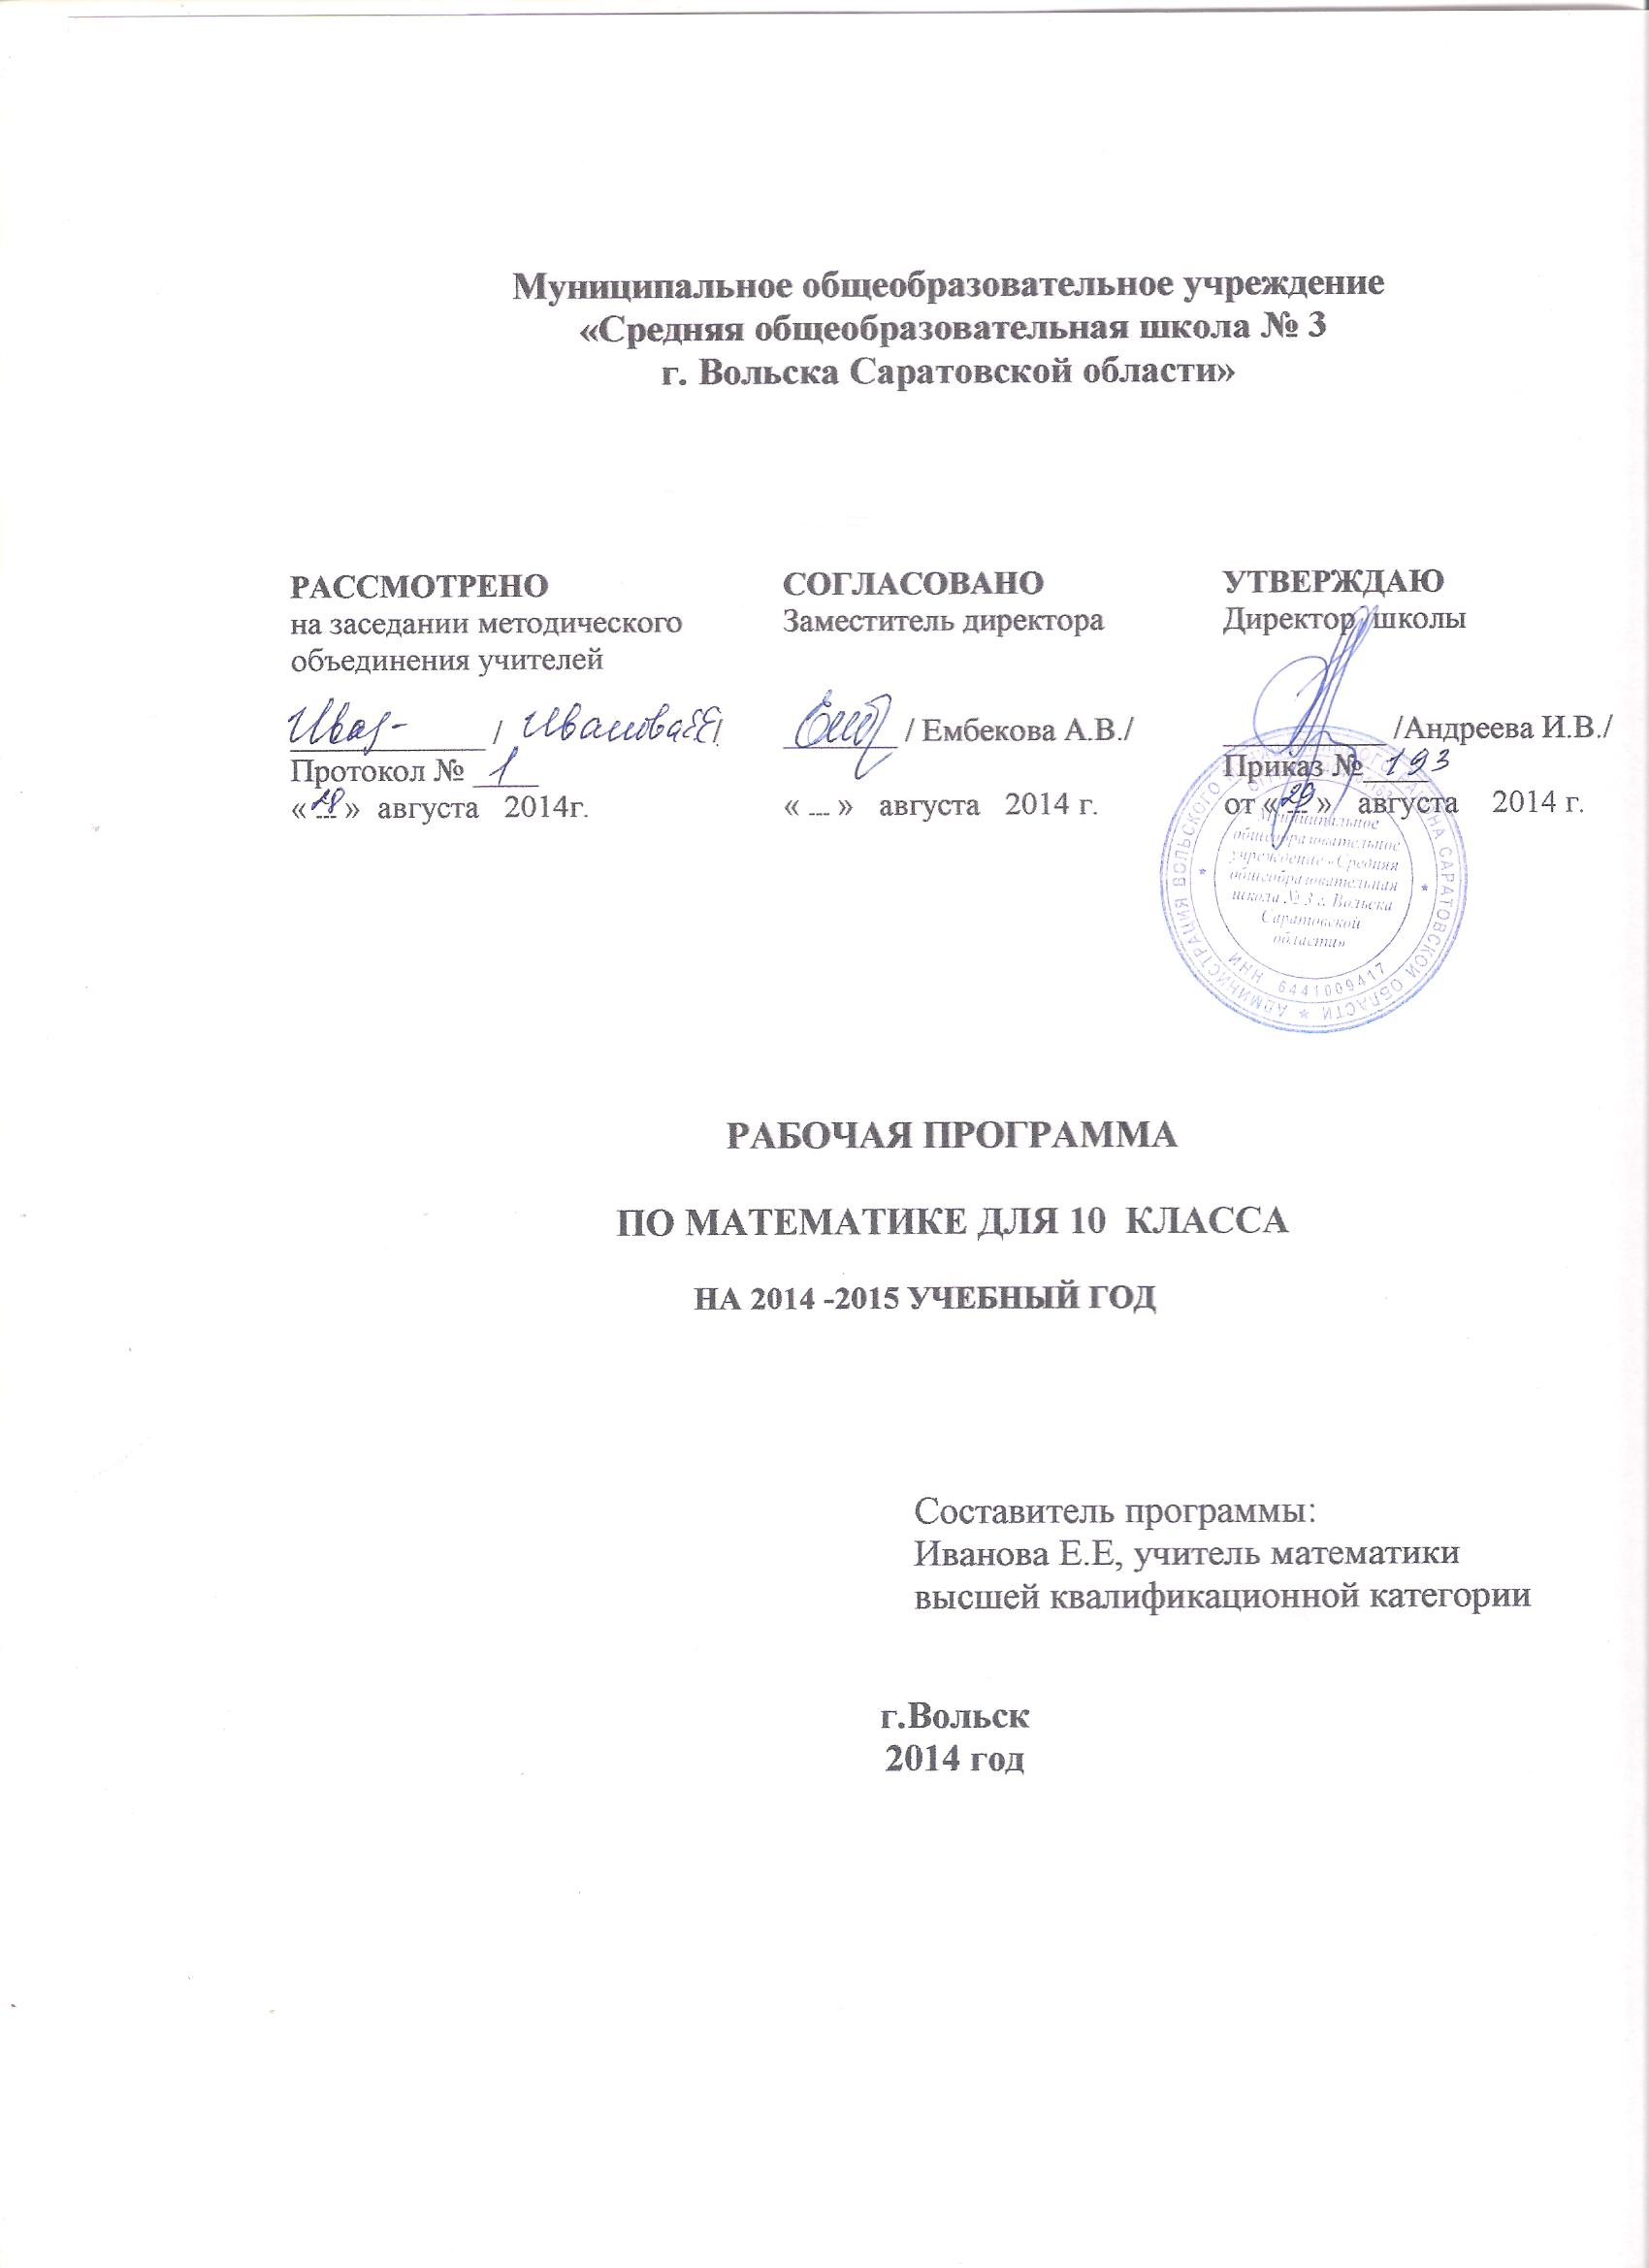 C:\Users\Елена\Documents\рабочие программы 2014-2015\титулы 2014\2014-09-05 10 класс 14\10 класс 14 001.jpg